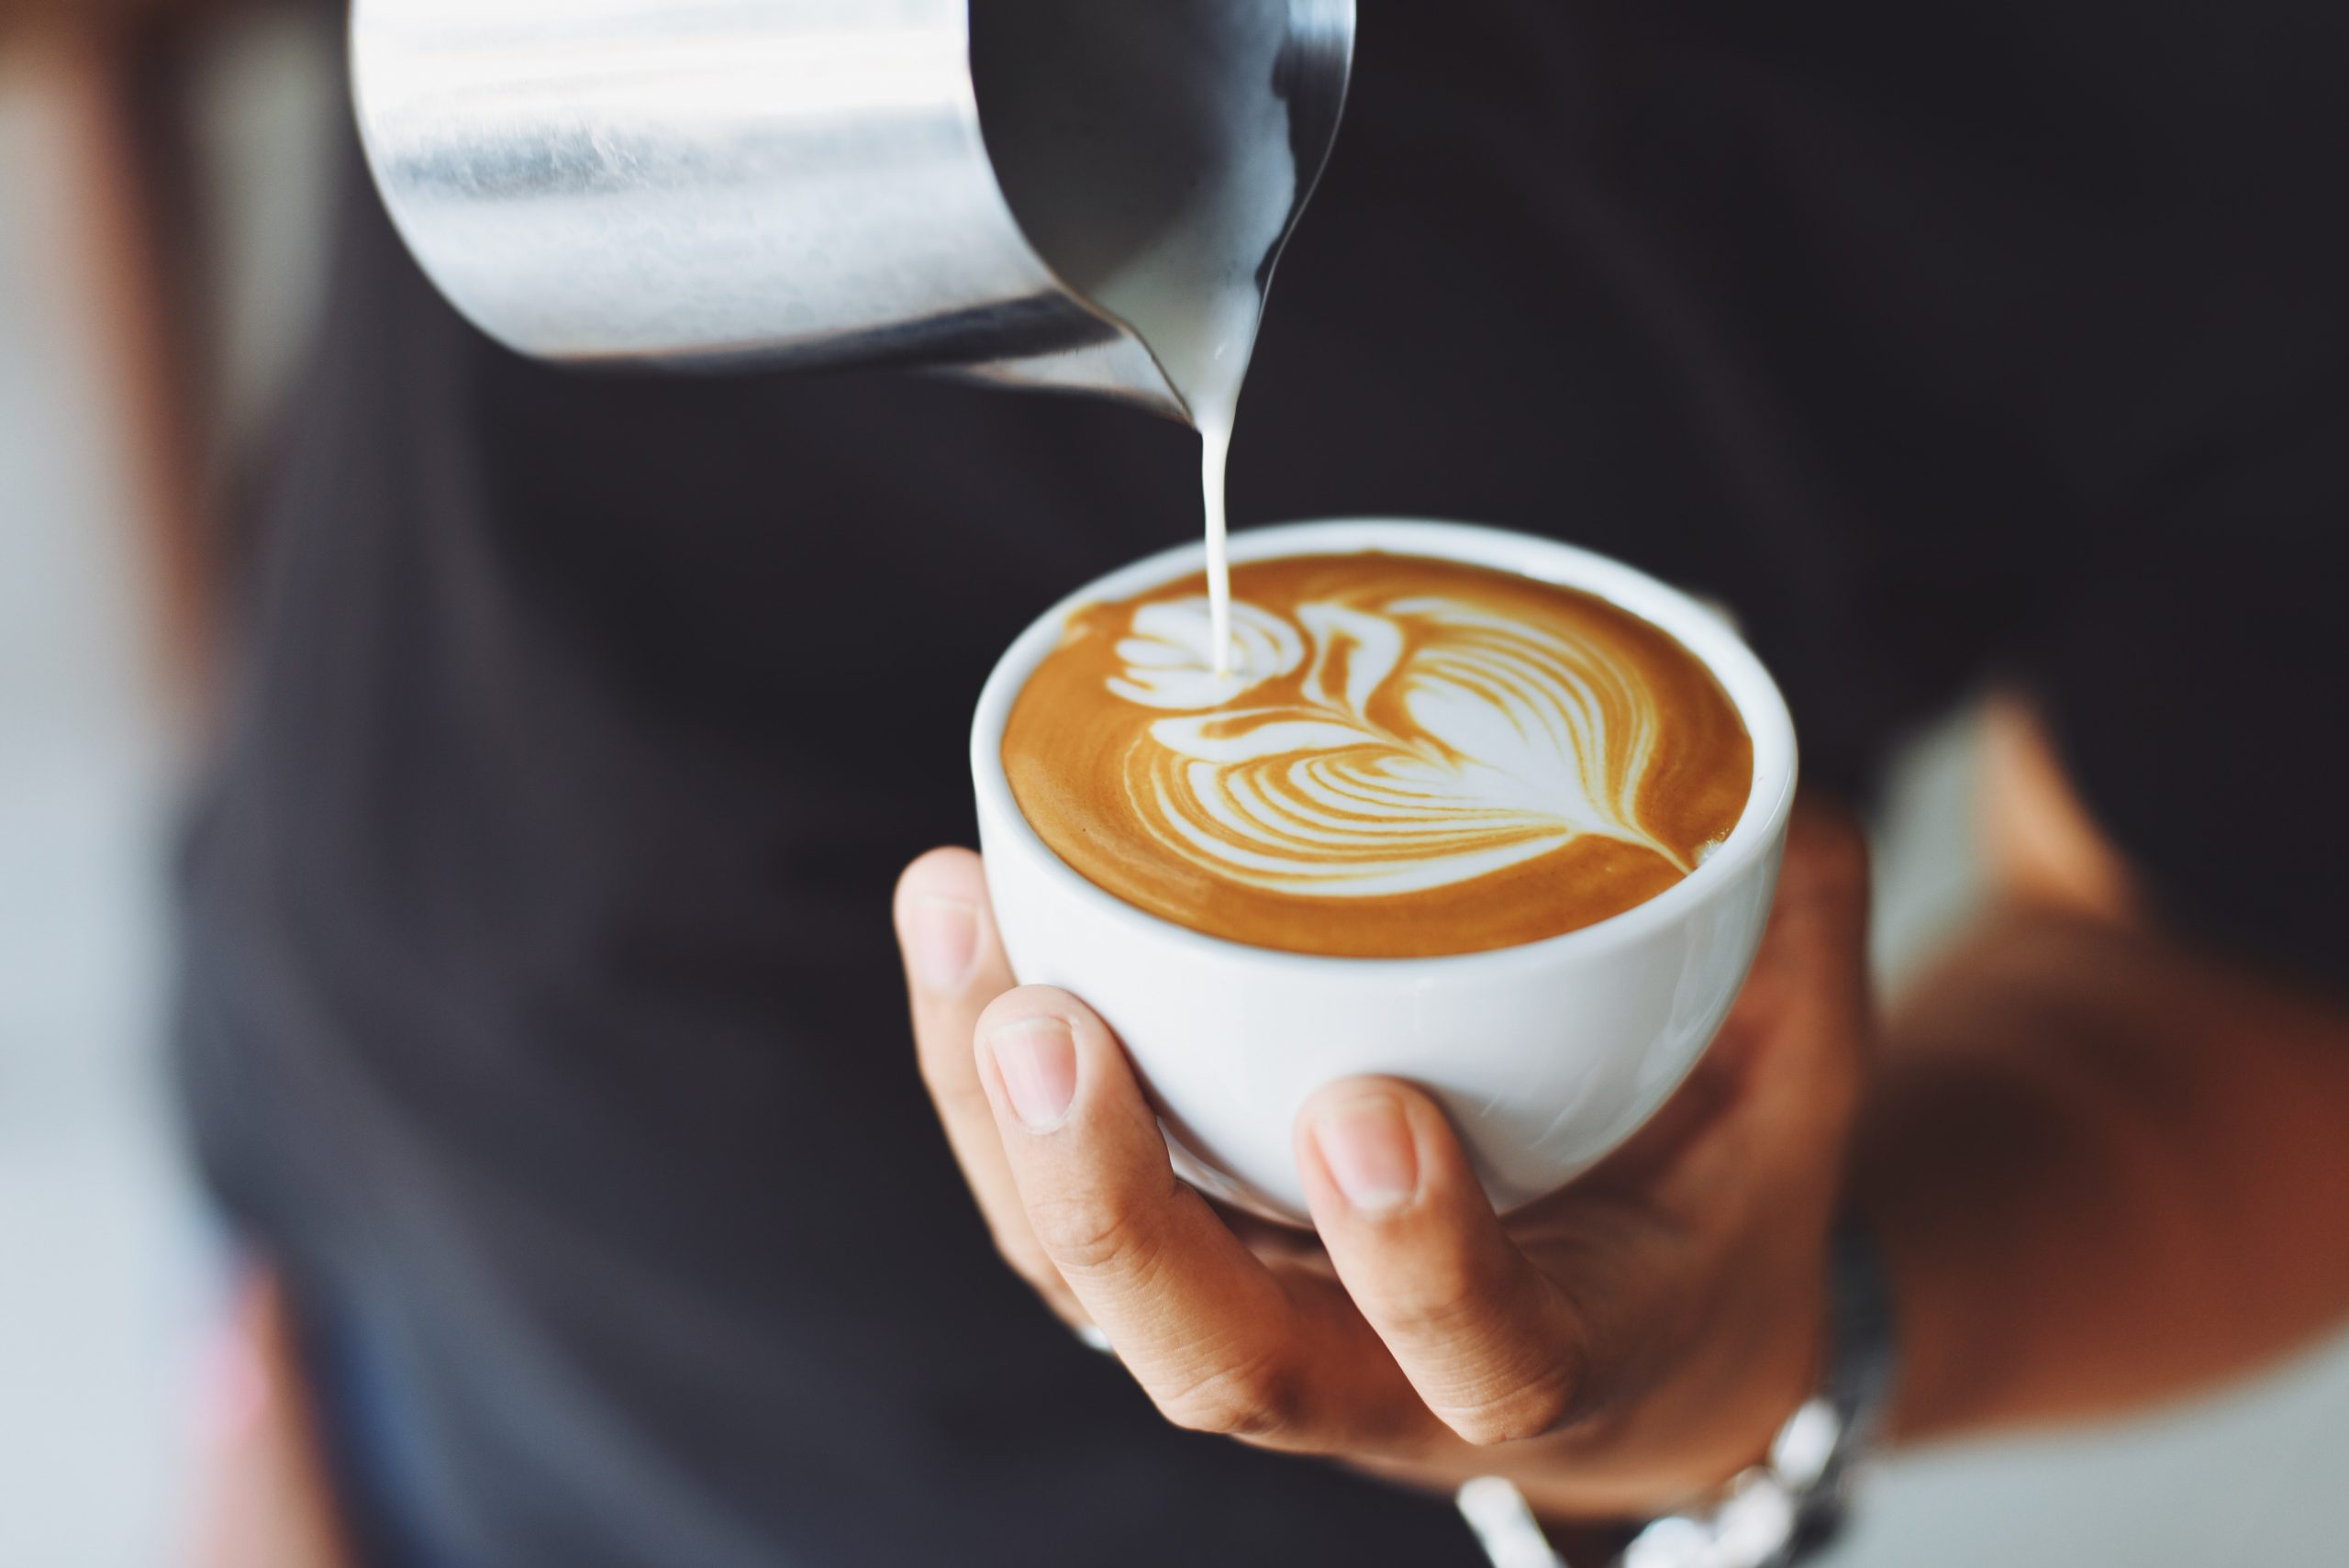 Grab A Mug: It's International Coffee Day!